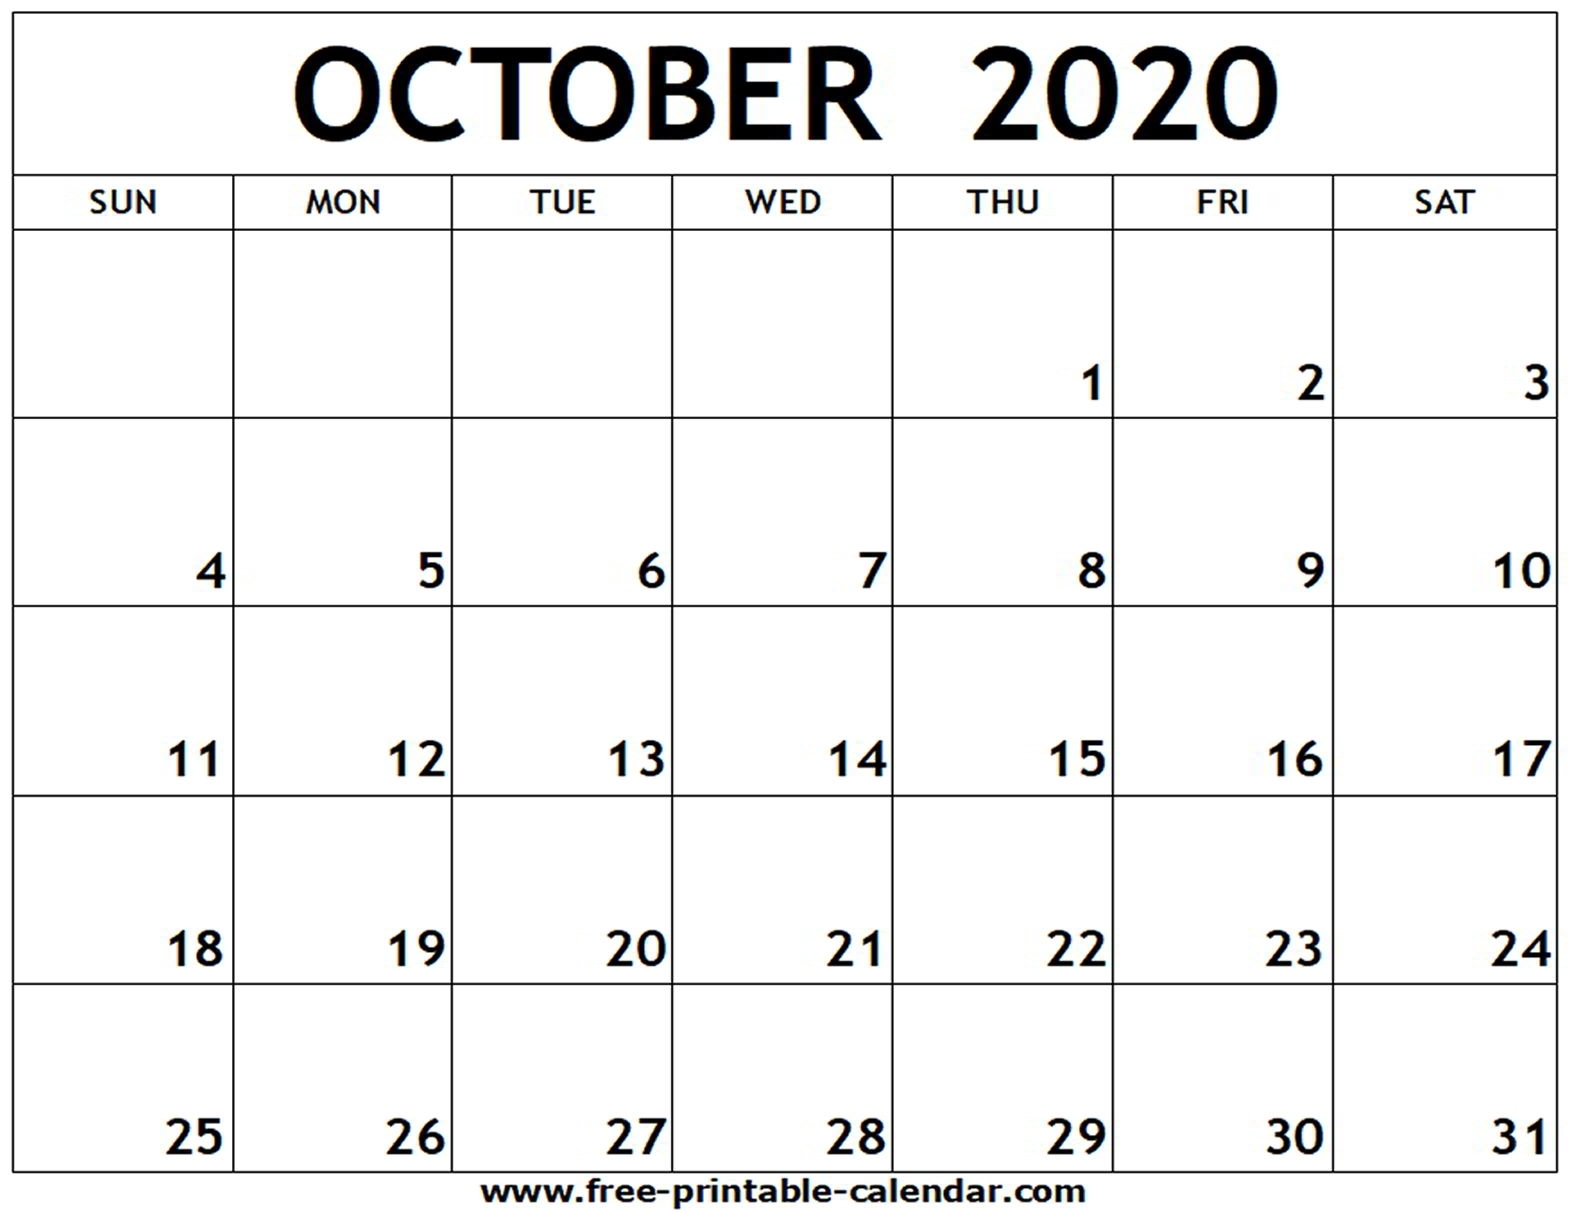 October 2020 Printable Calendar - Free-Printable-Calendar in 2020 Fill In Calendar Fill In